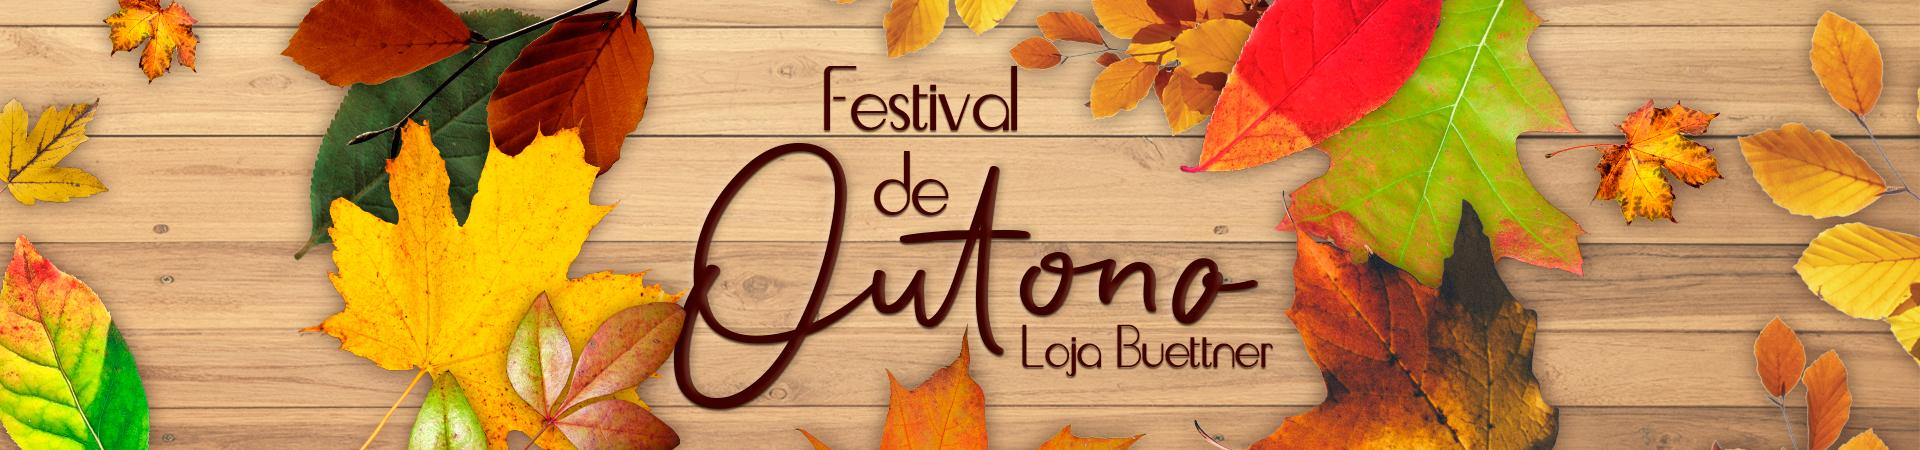 Outono Loja Buettner >> Loja Buettner   Comprar Agora!